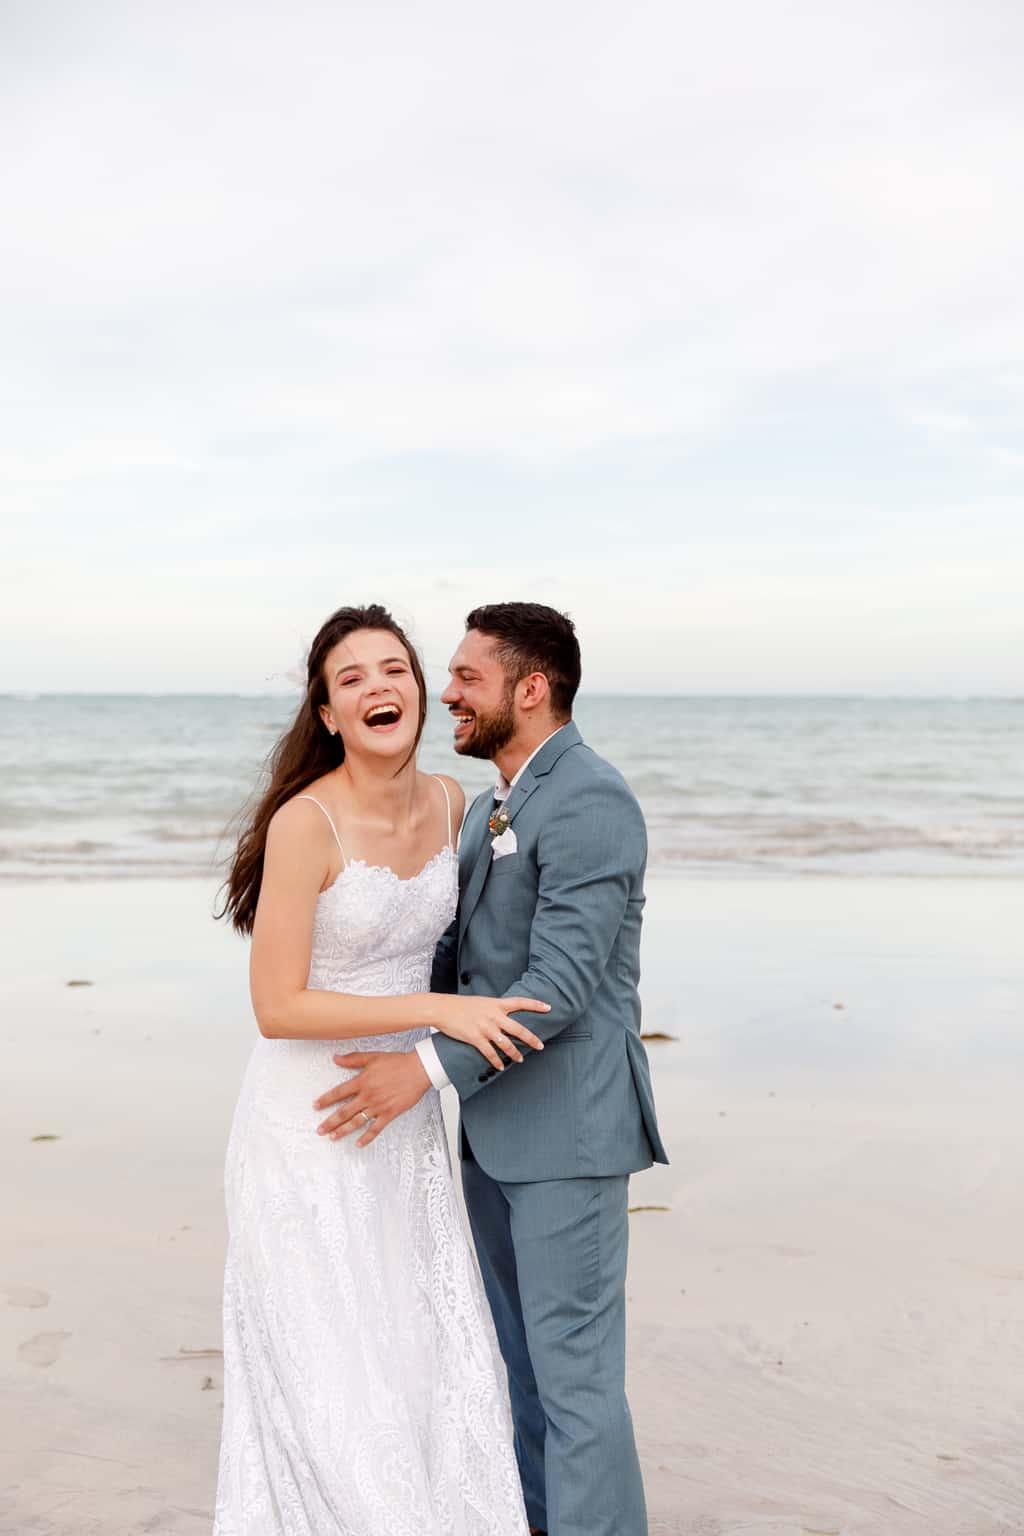 Casamento-Emanuelle-e-Alysson-Fotografia-Tadeu-Nanó-e-Luca-Antunes-941